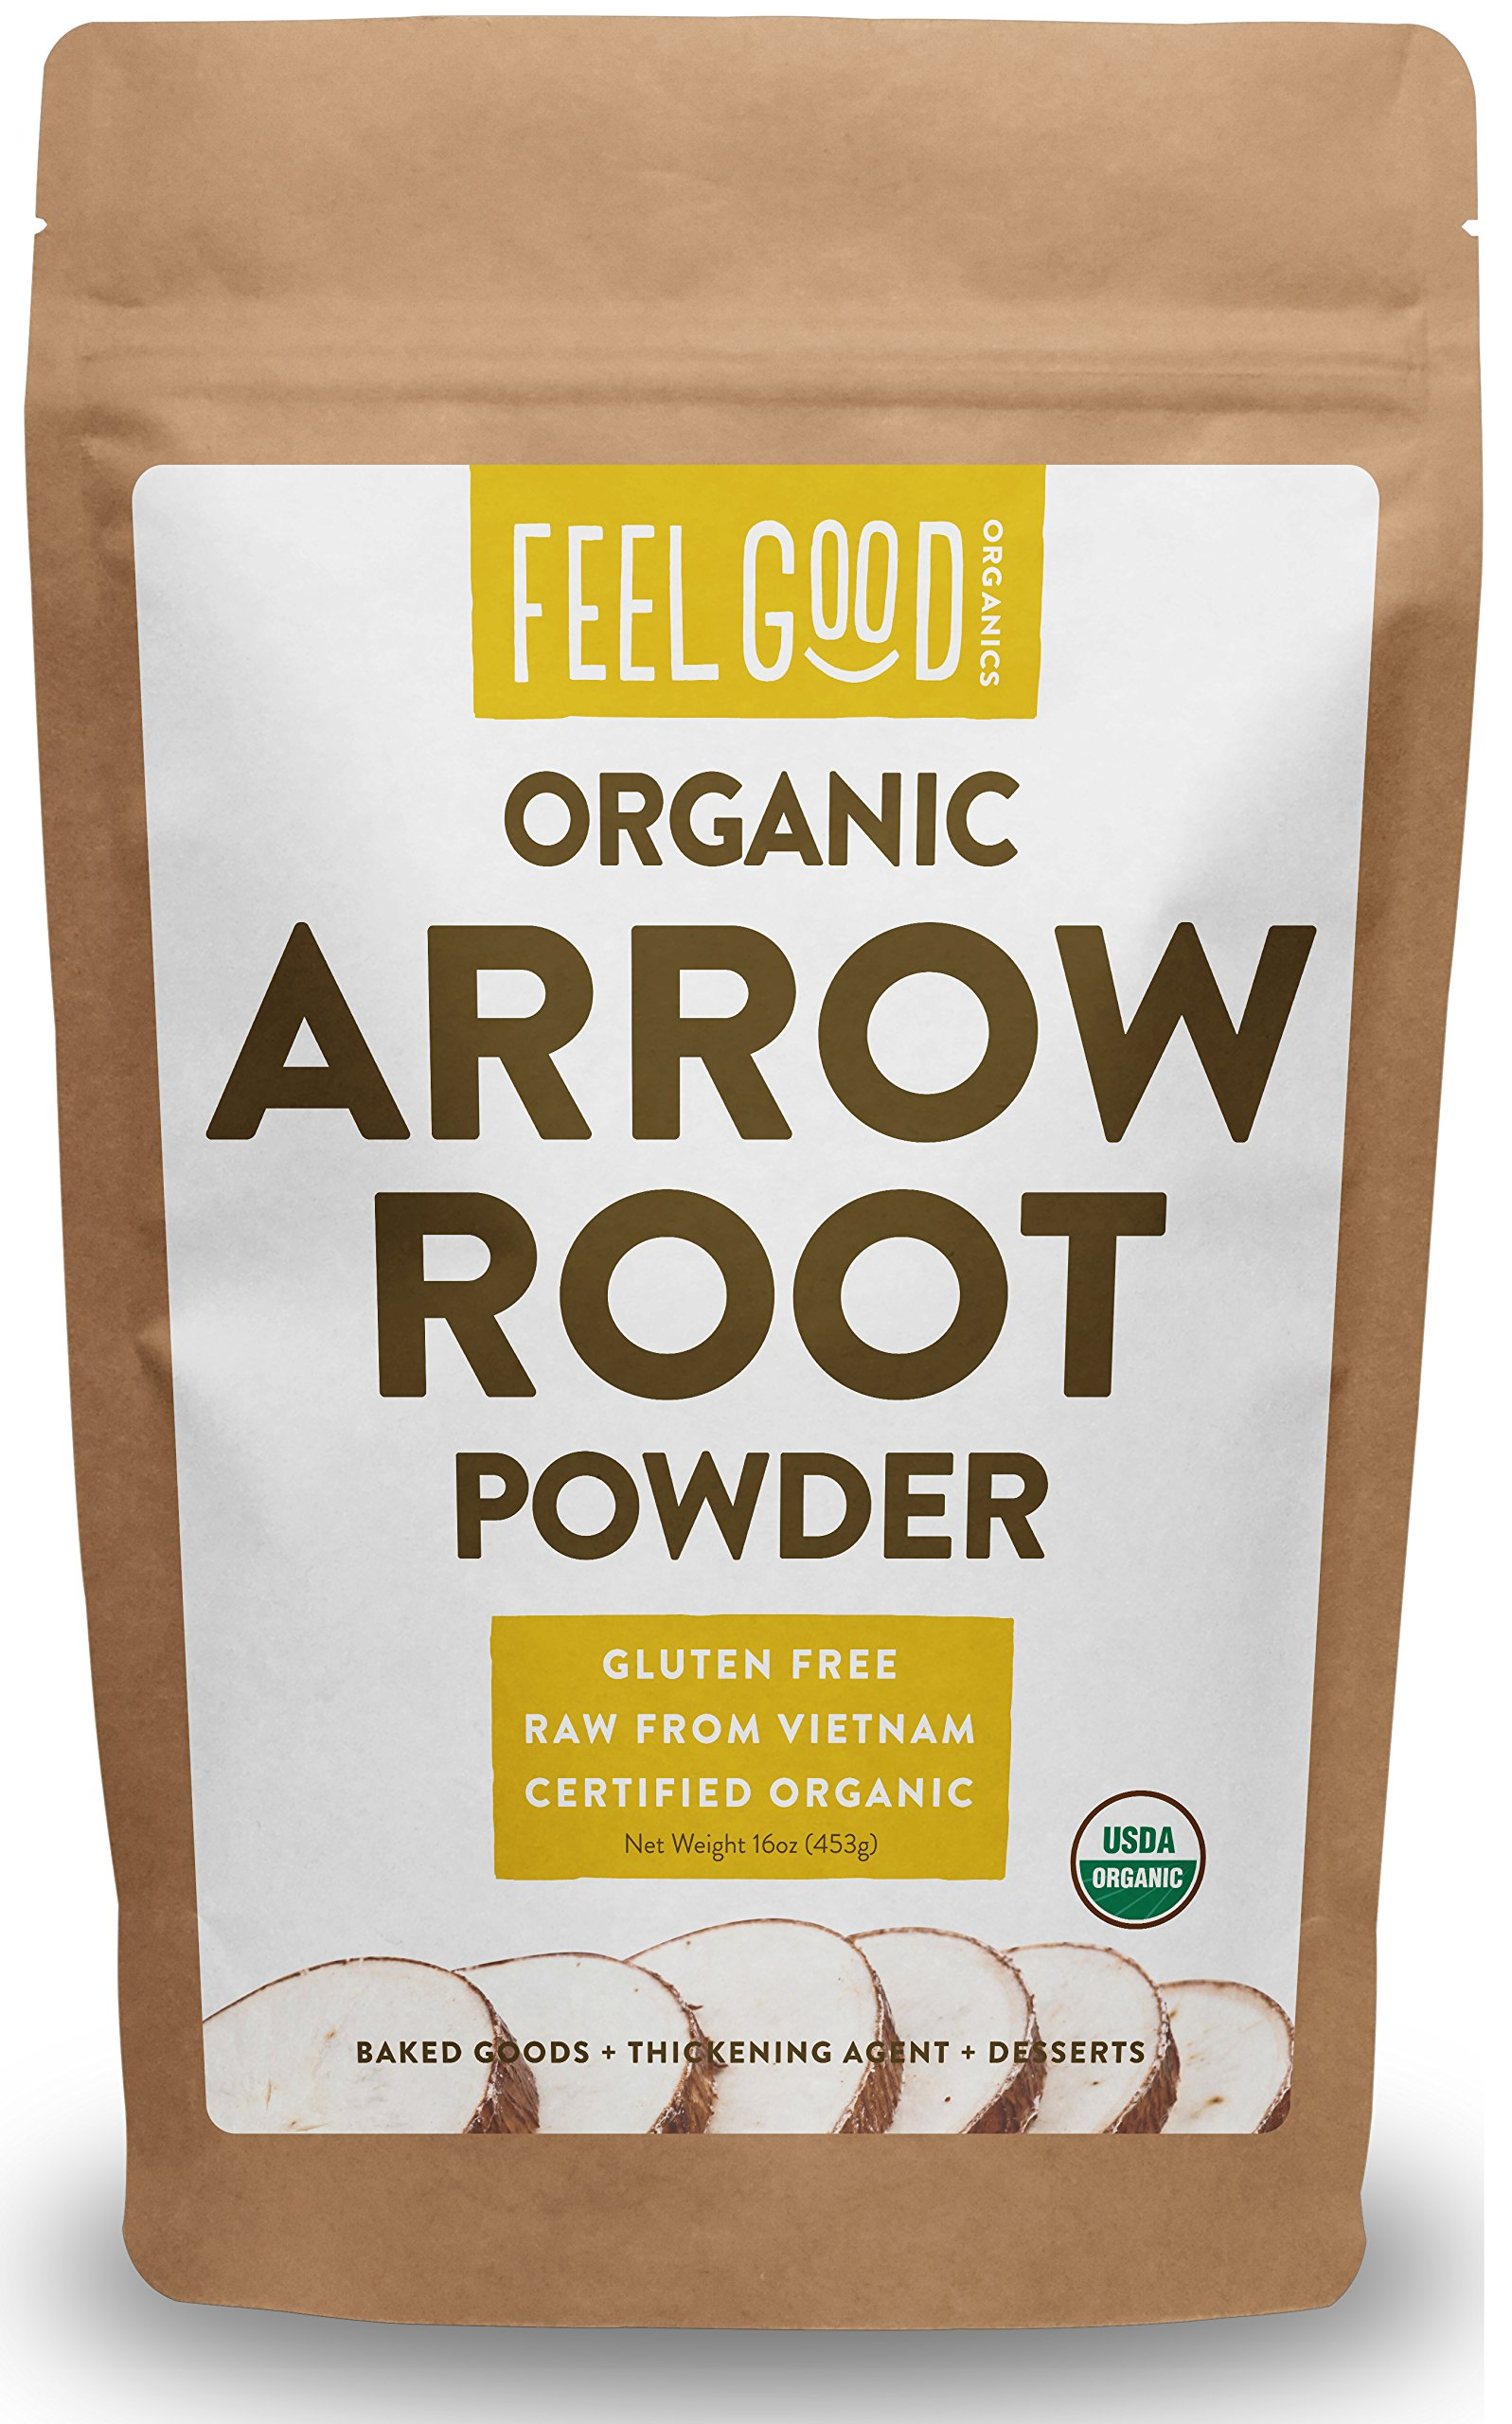 Organic Arrowroot Powder (Flour) - 1 Pound Resealable Bag (16oz) - 100% Raw From Vietnam - by Feel Good Organics